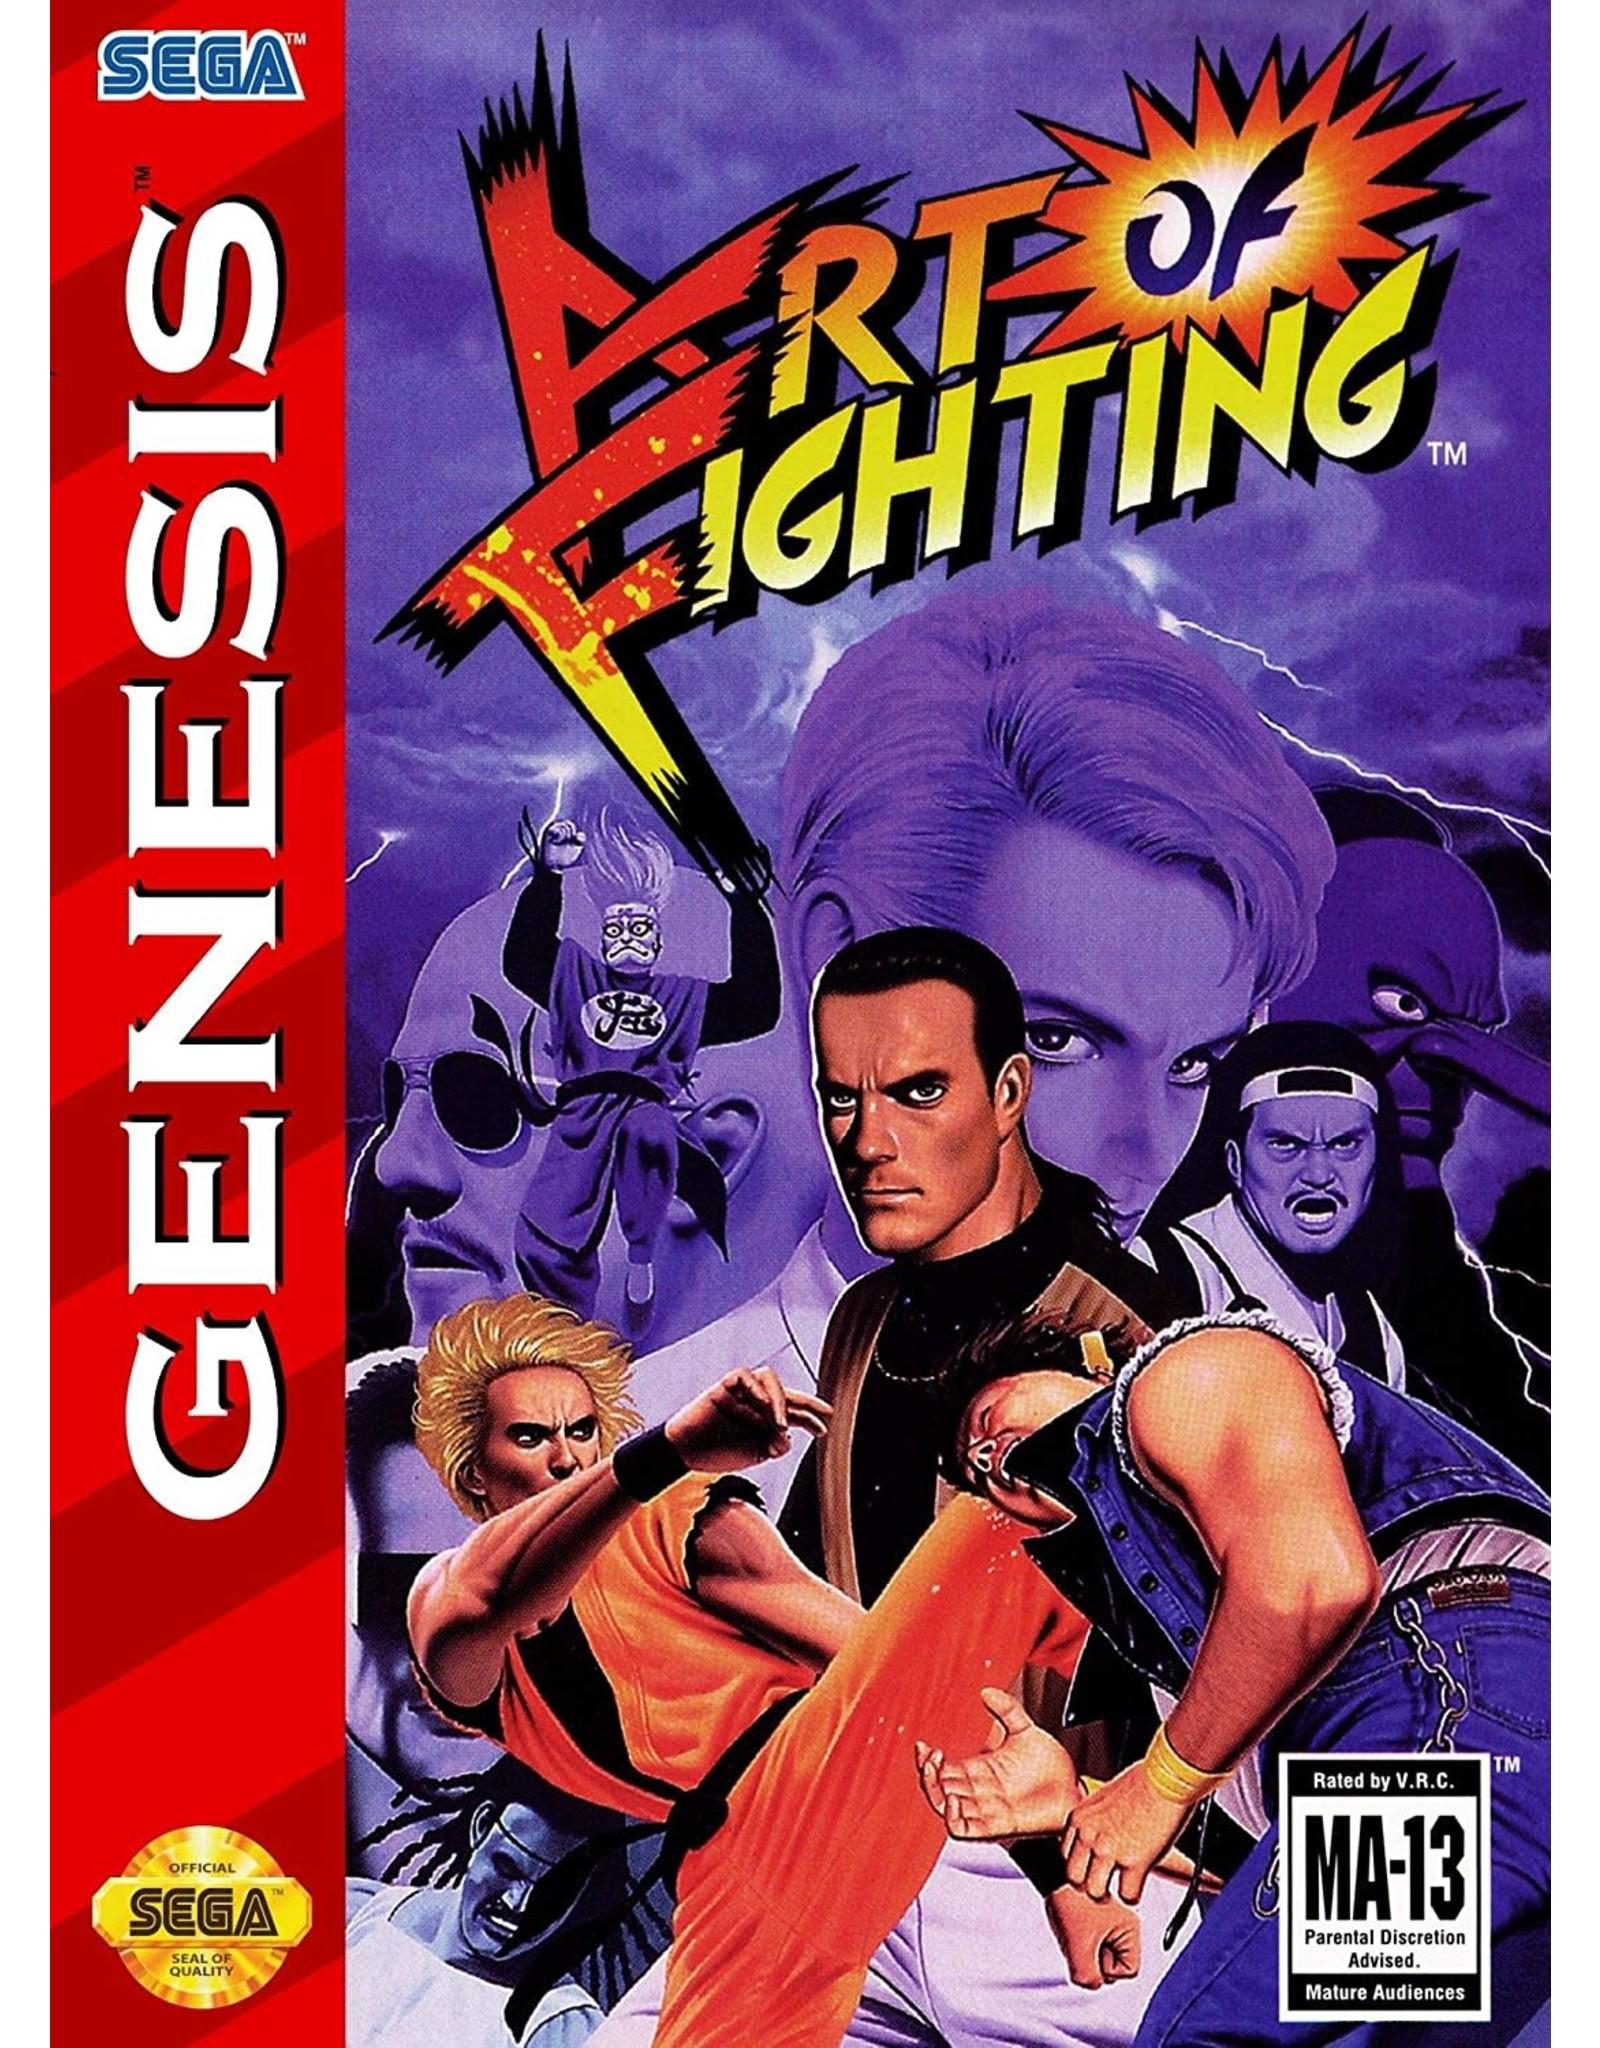 Sega Genesis Art of Fighting (Cart Only)